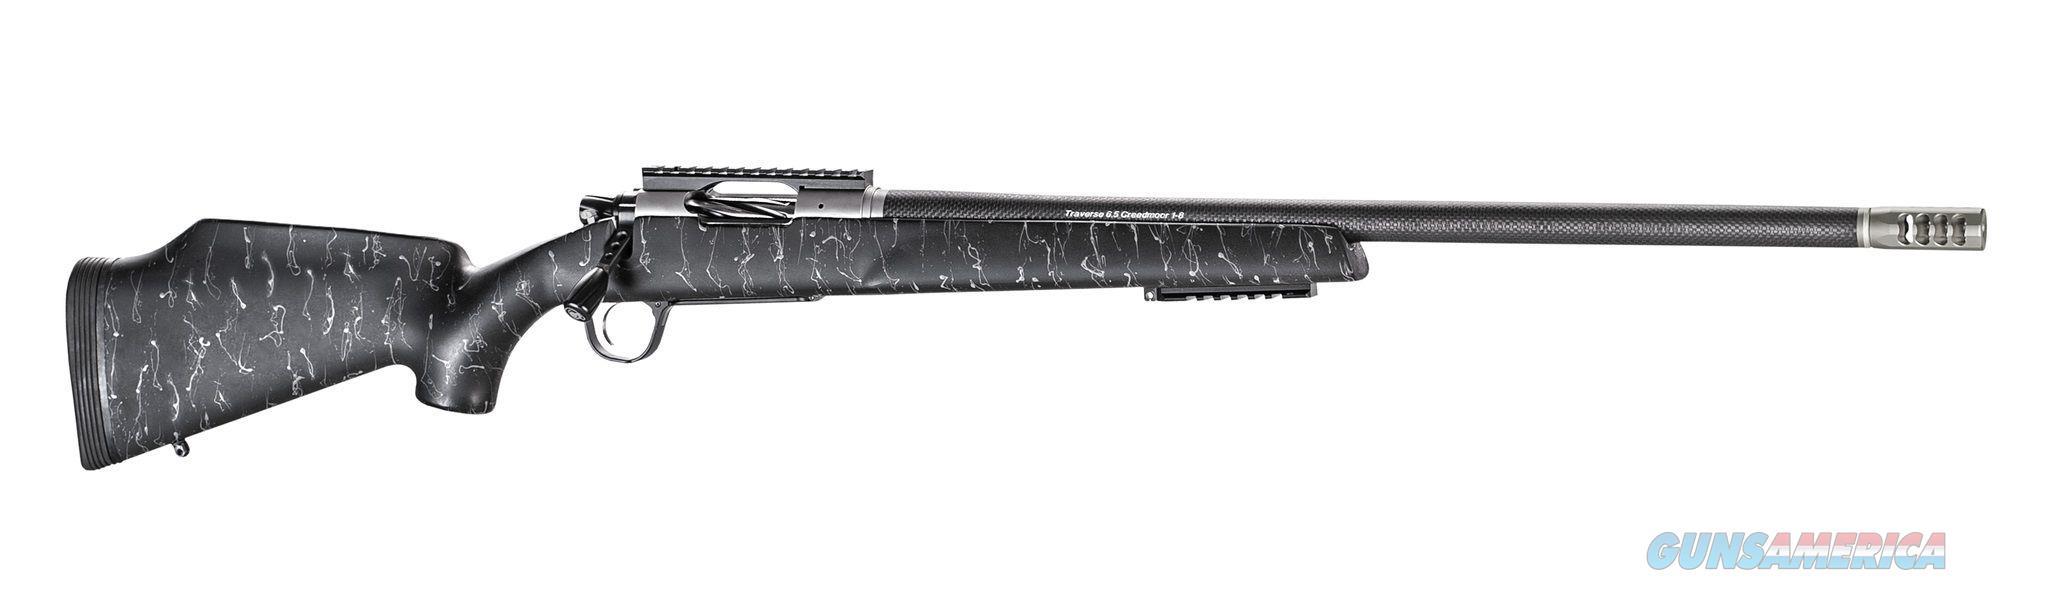 "Christensen Arms Traverse .300 WSM 24"" TB 4 Rds 801-10016-00  Guns > Rifles > Custom Rifles > Bolt Action"